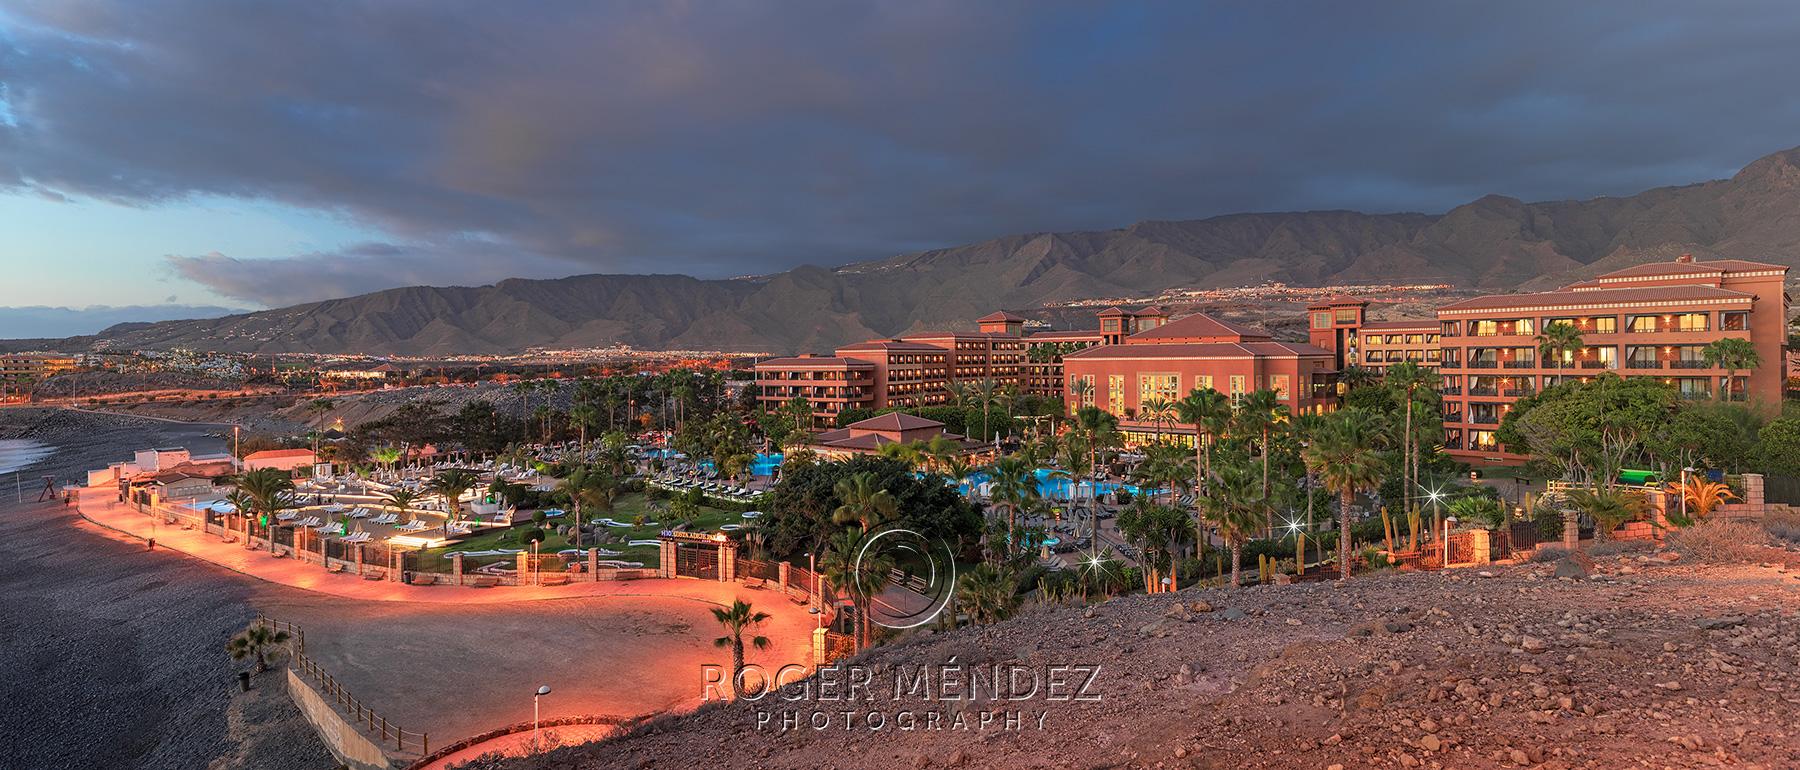 Vista exterior panorámica del hotel H10 Costa Adeje Palace